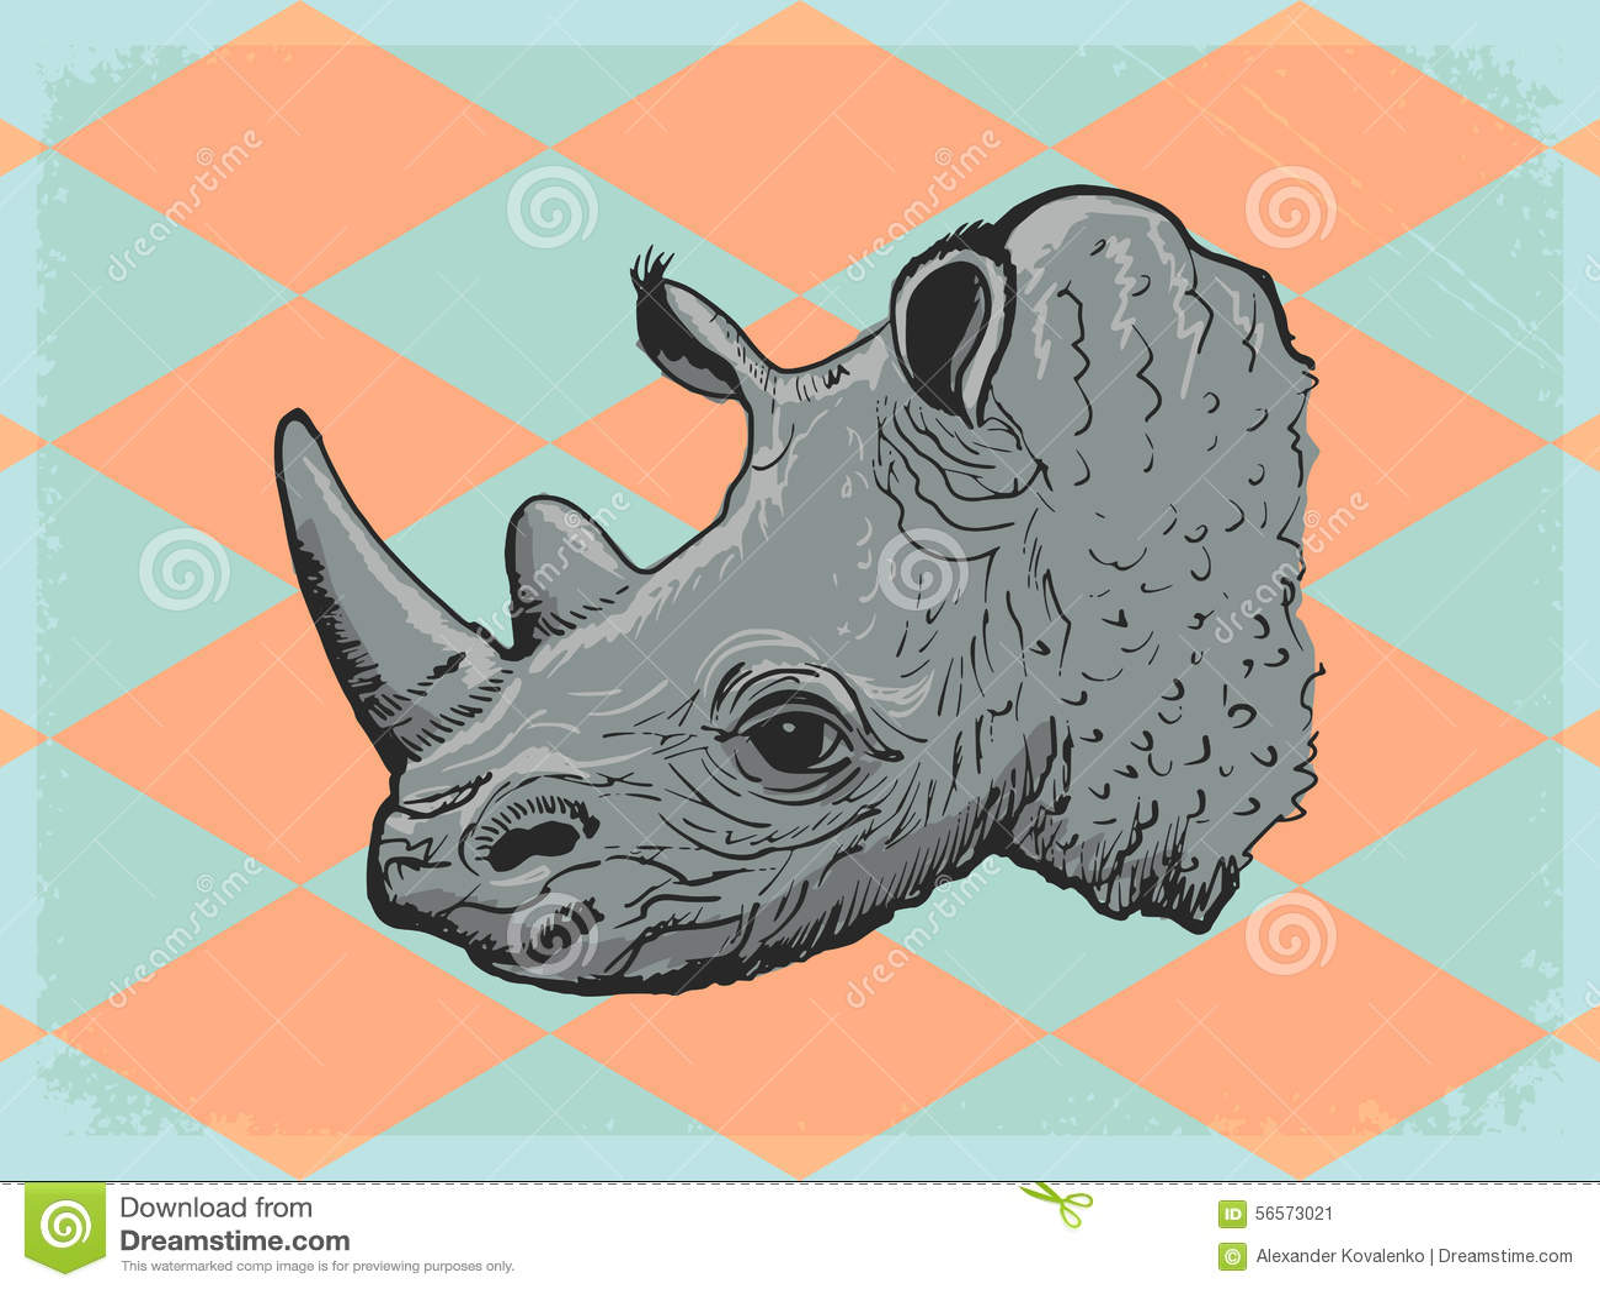 Download Εκλεκτής ποιότητας υπόβαθρο με το ρινόκερο Απεικόνιση αποθεμάτων - εικονογραφία από βρώμικος, τραχύς: 56573021